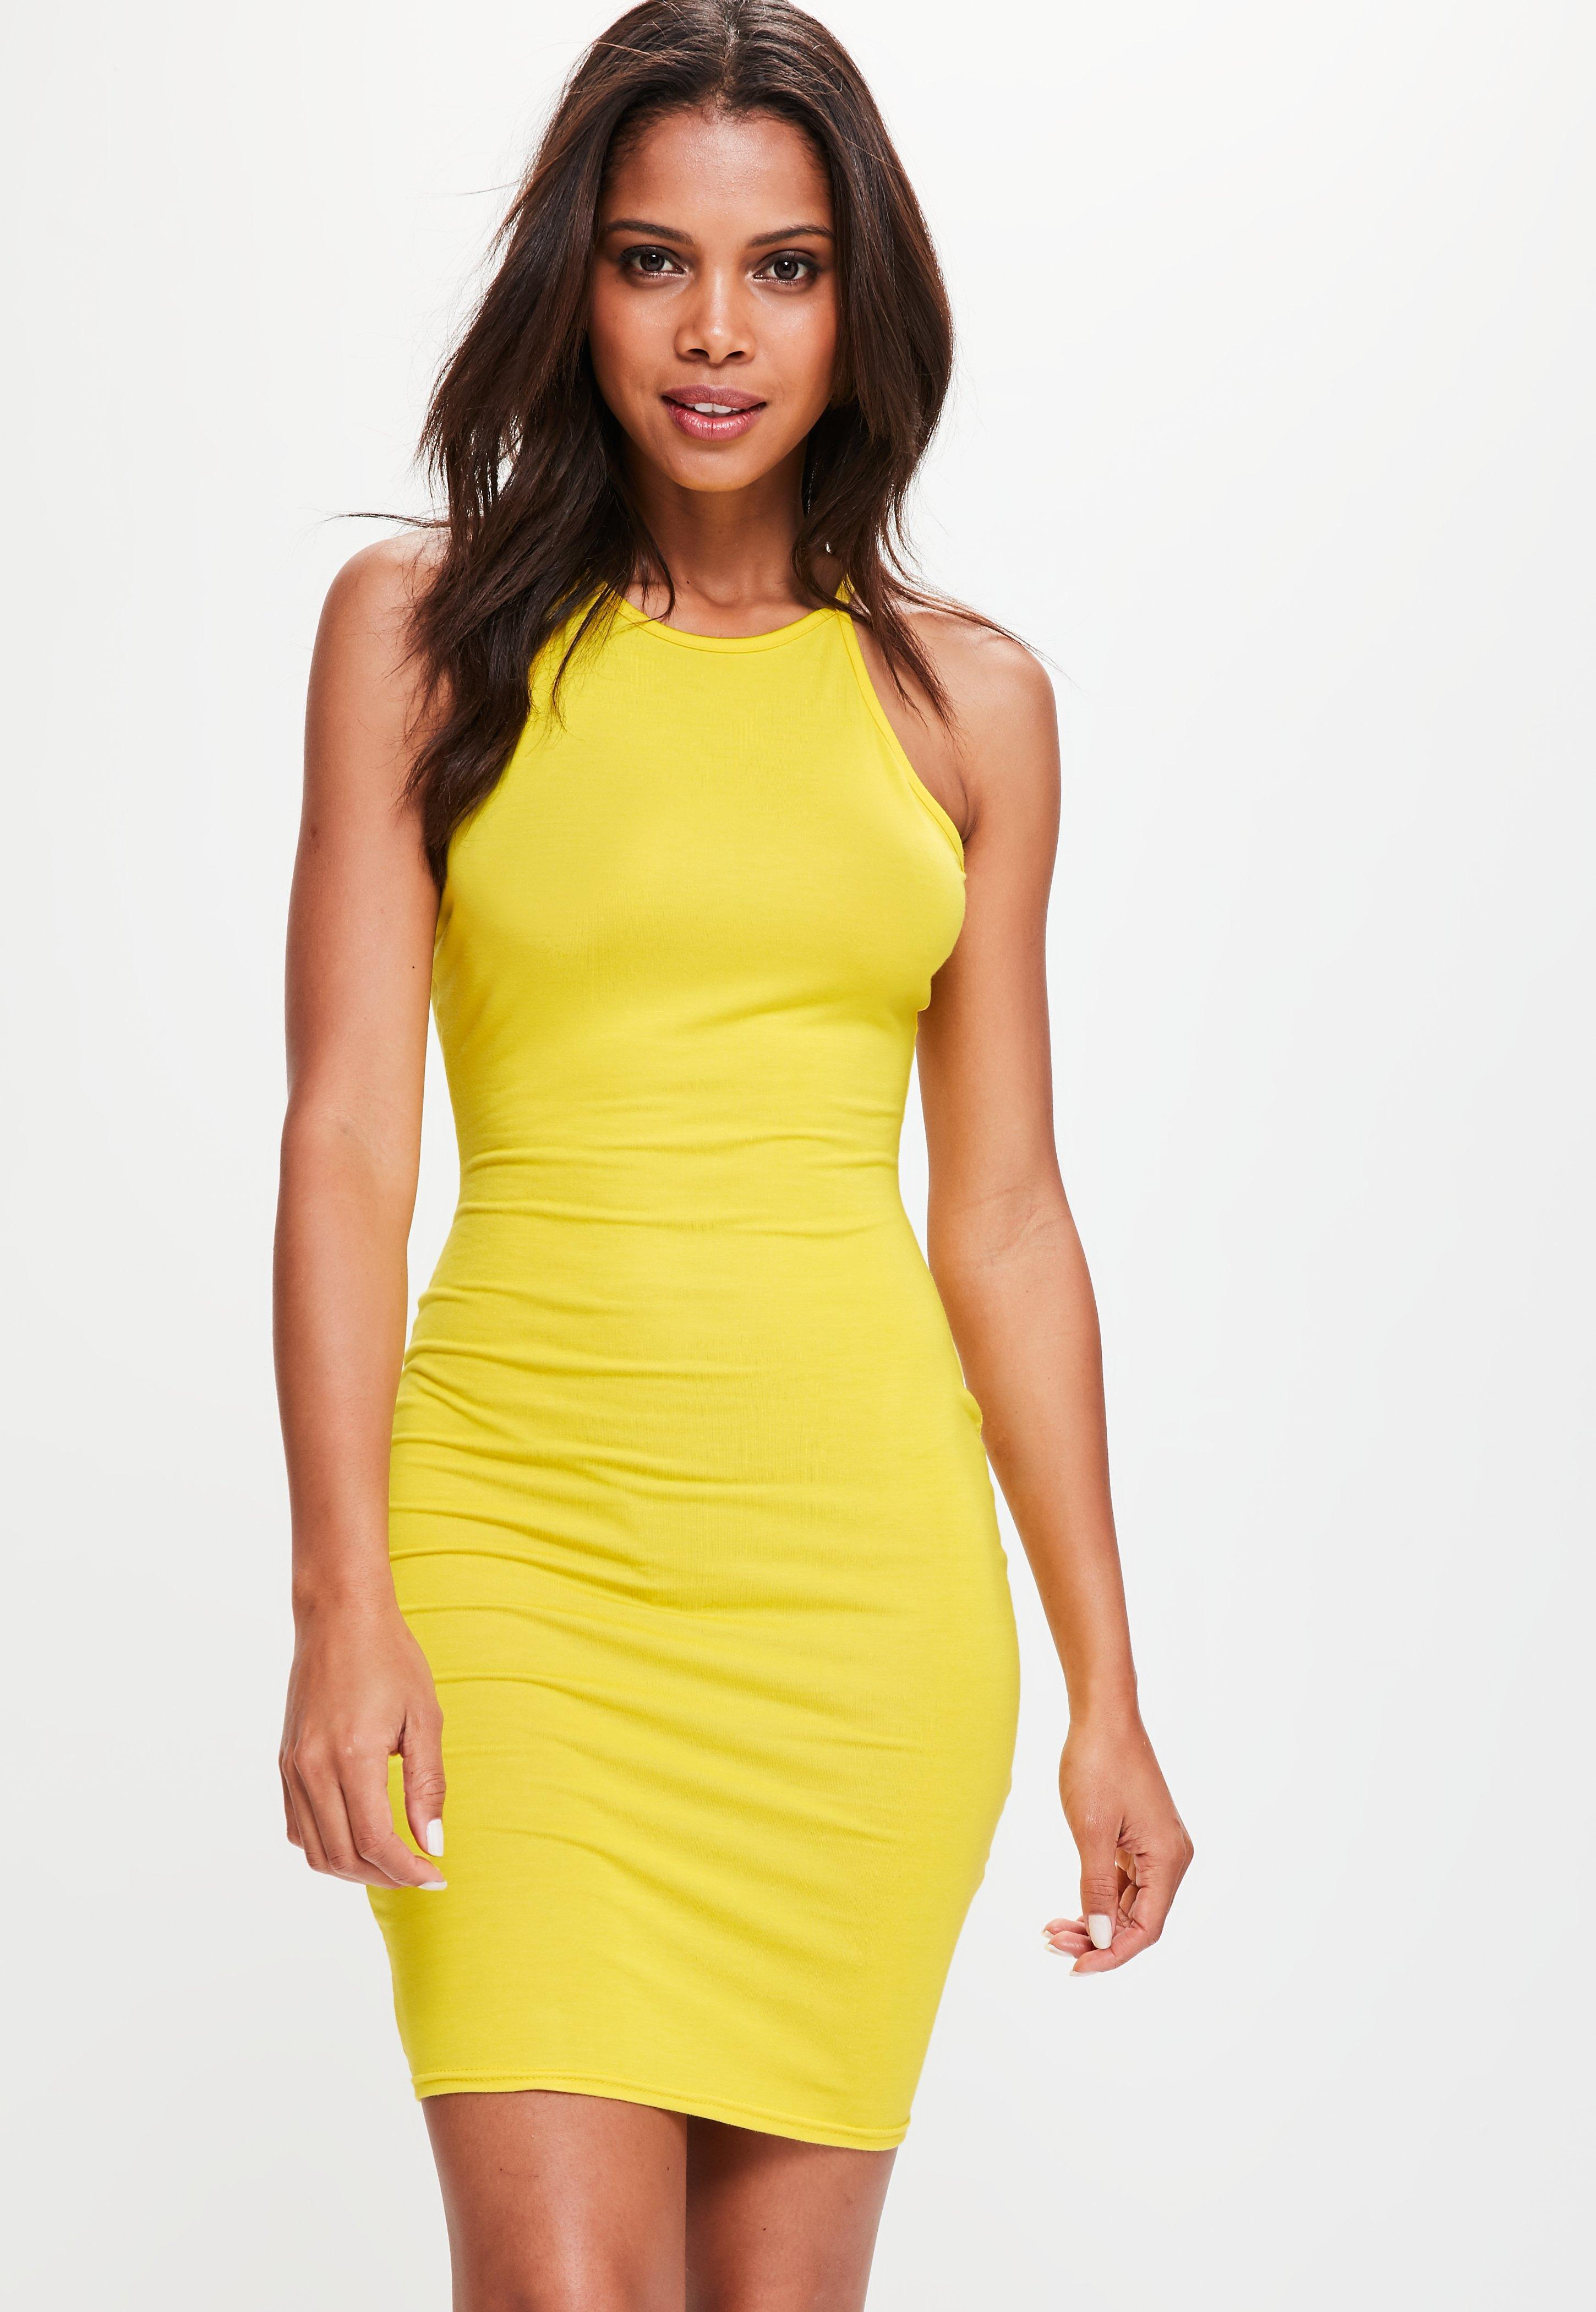 Yellow latex bodycon dress women boutique